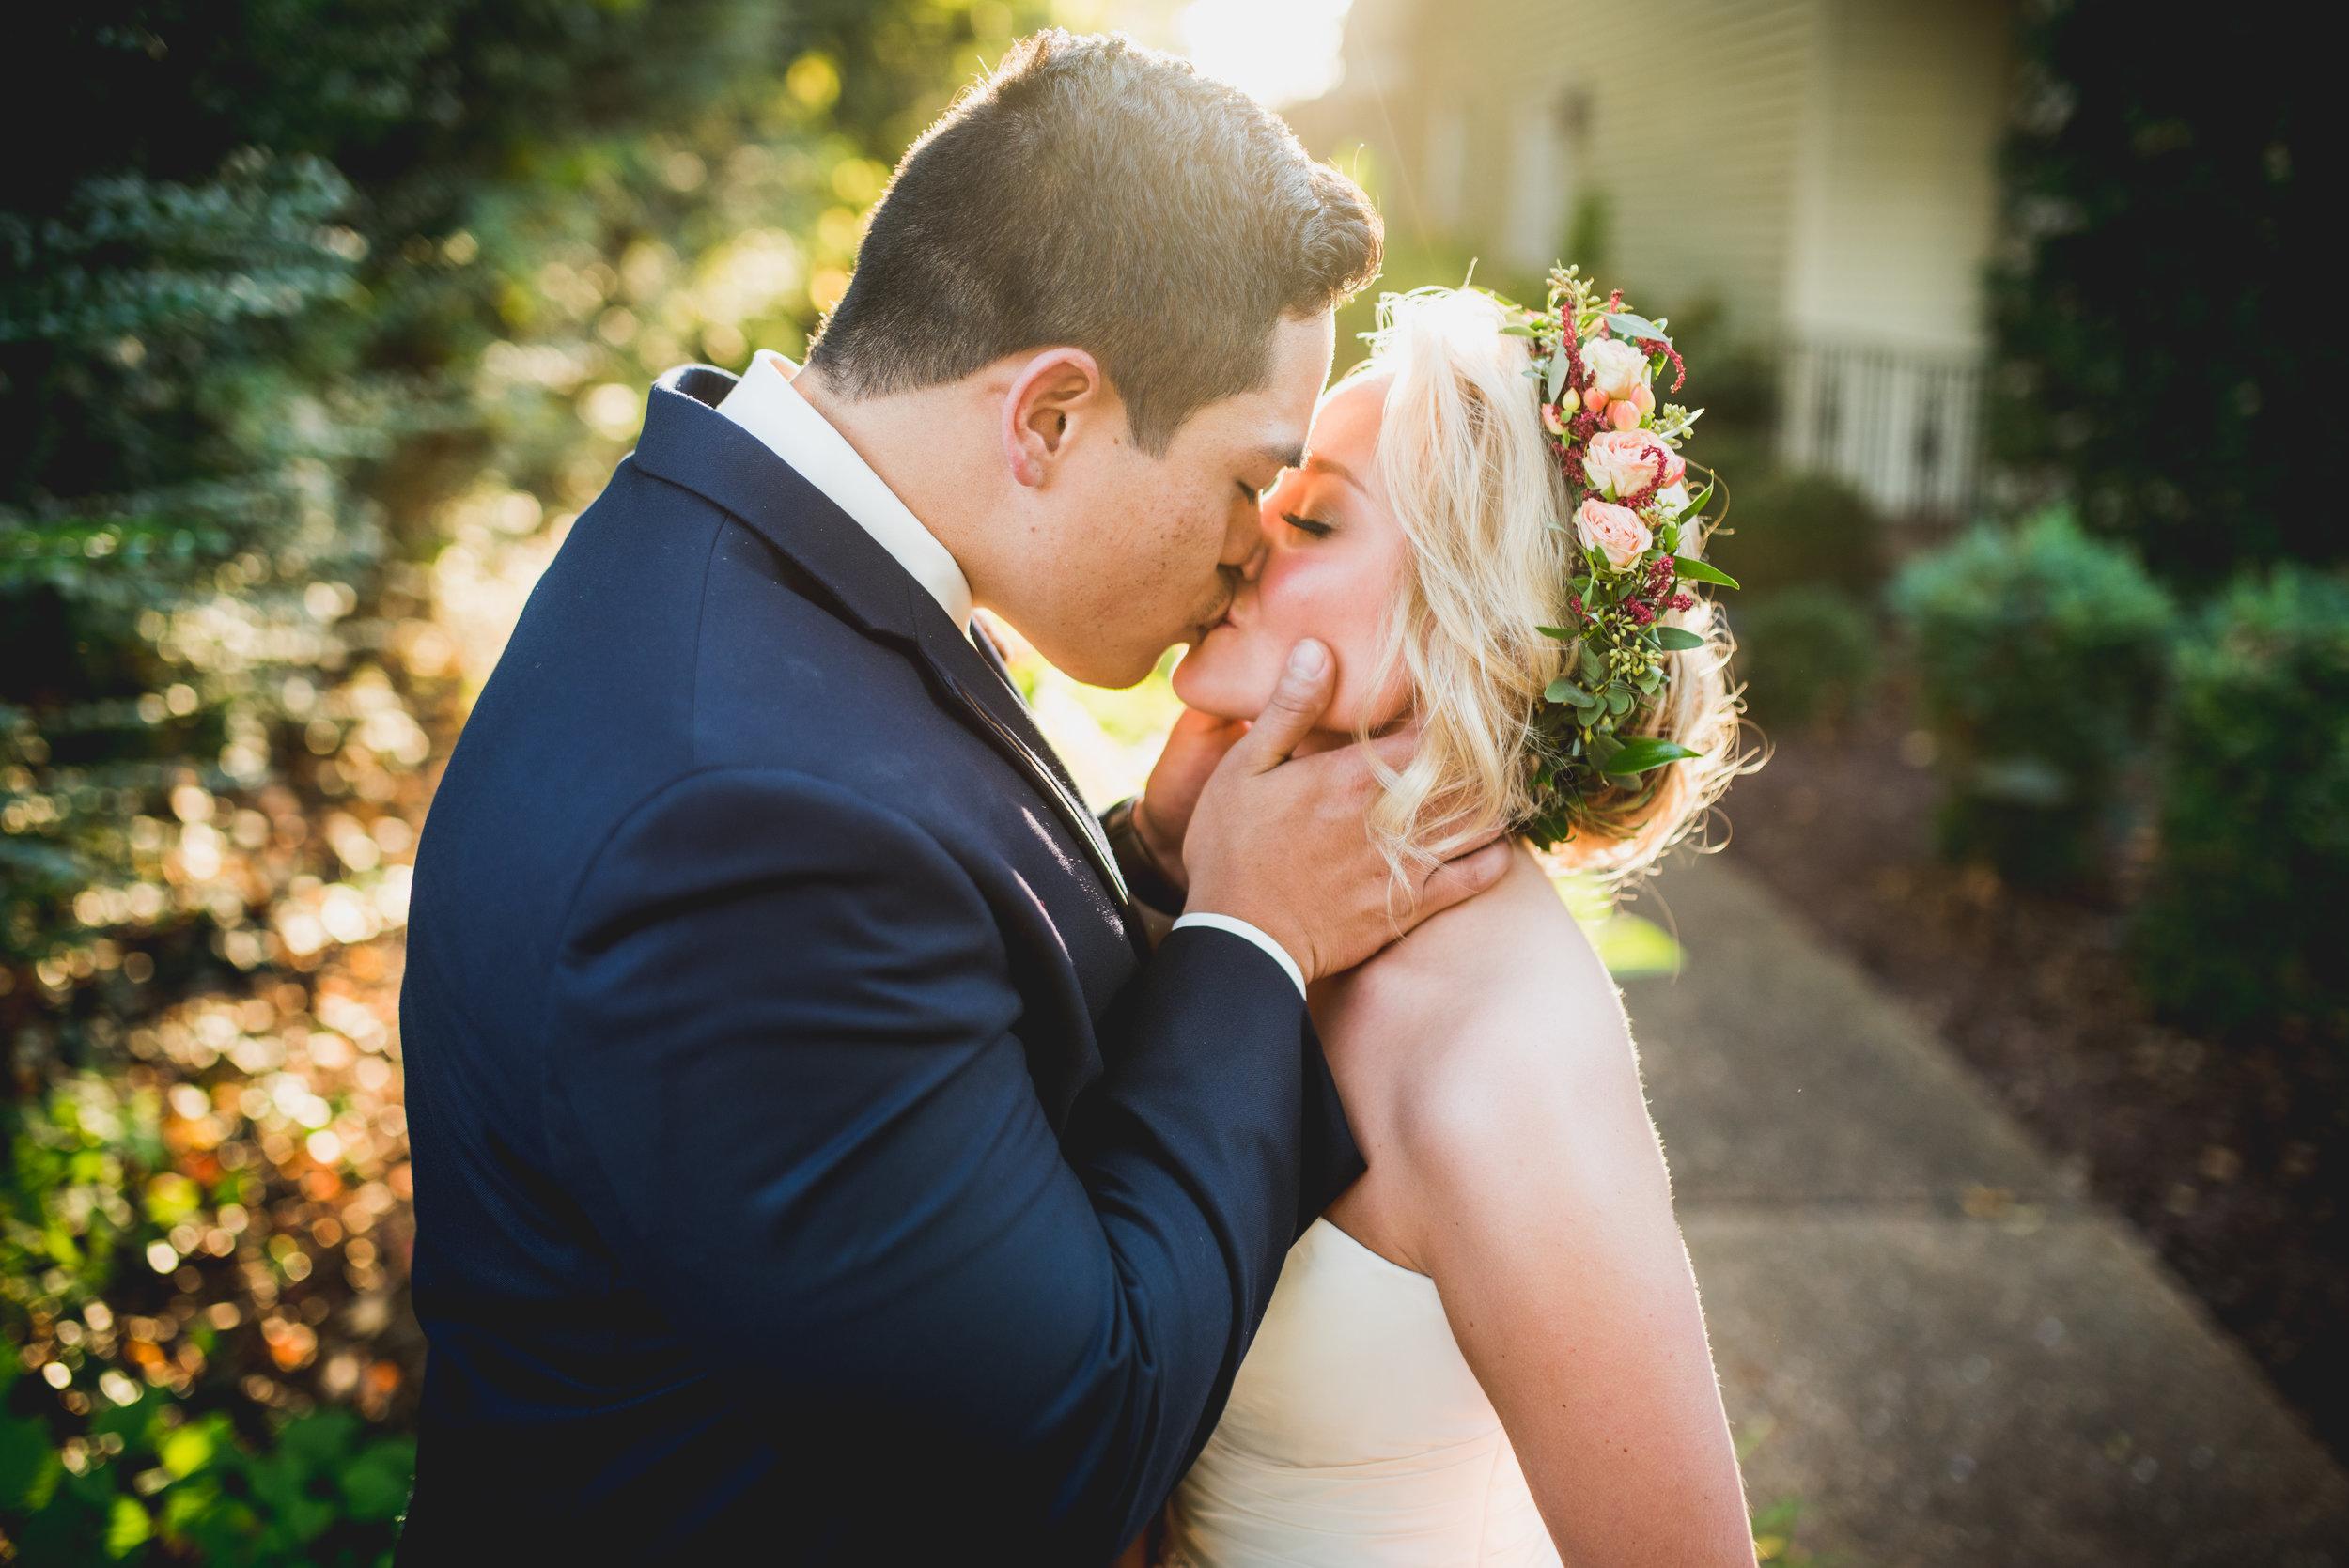 Nashville-wedding-photographers-CJ's-Off-The-Square-43.JPG